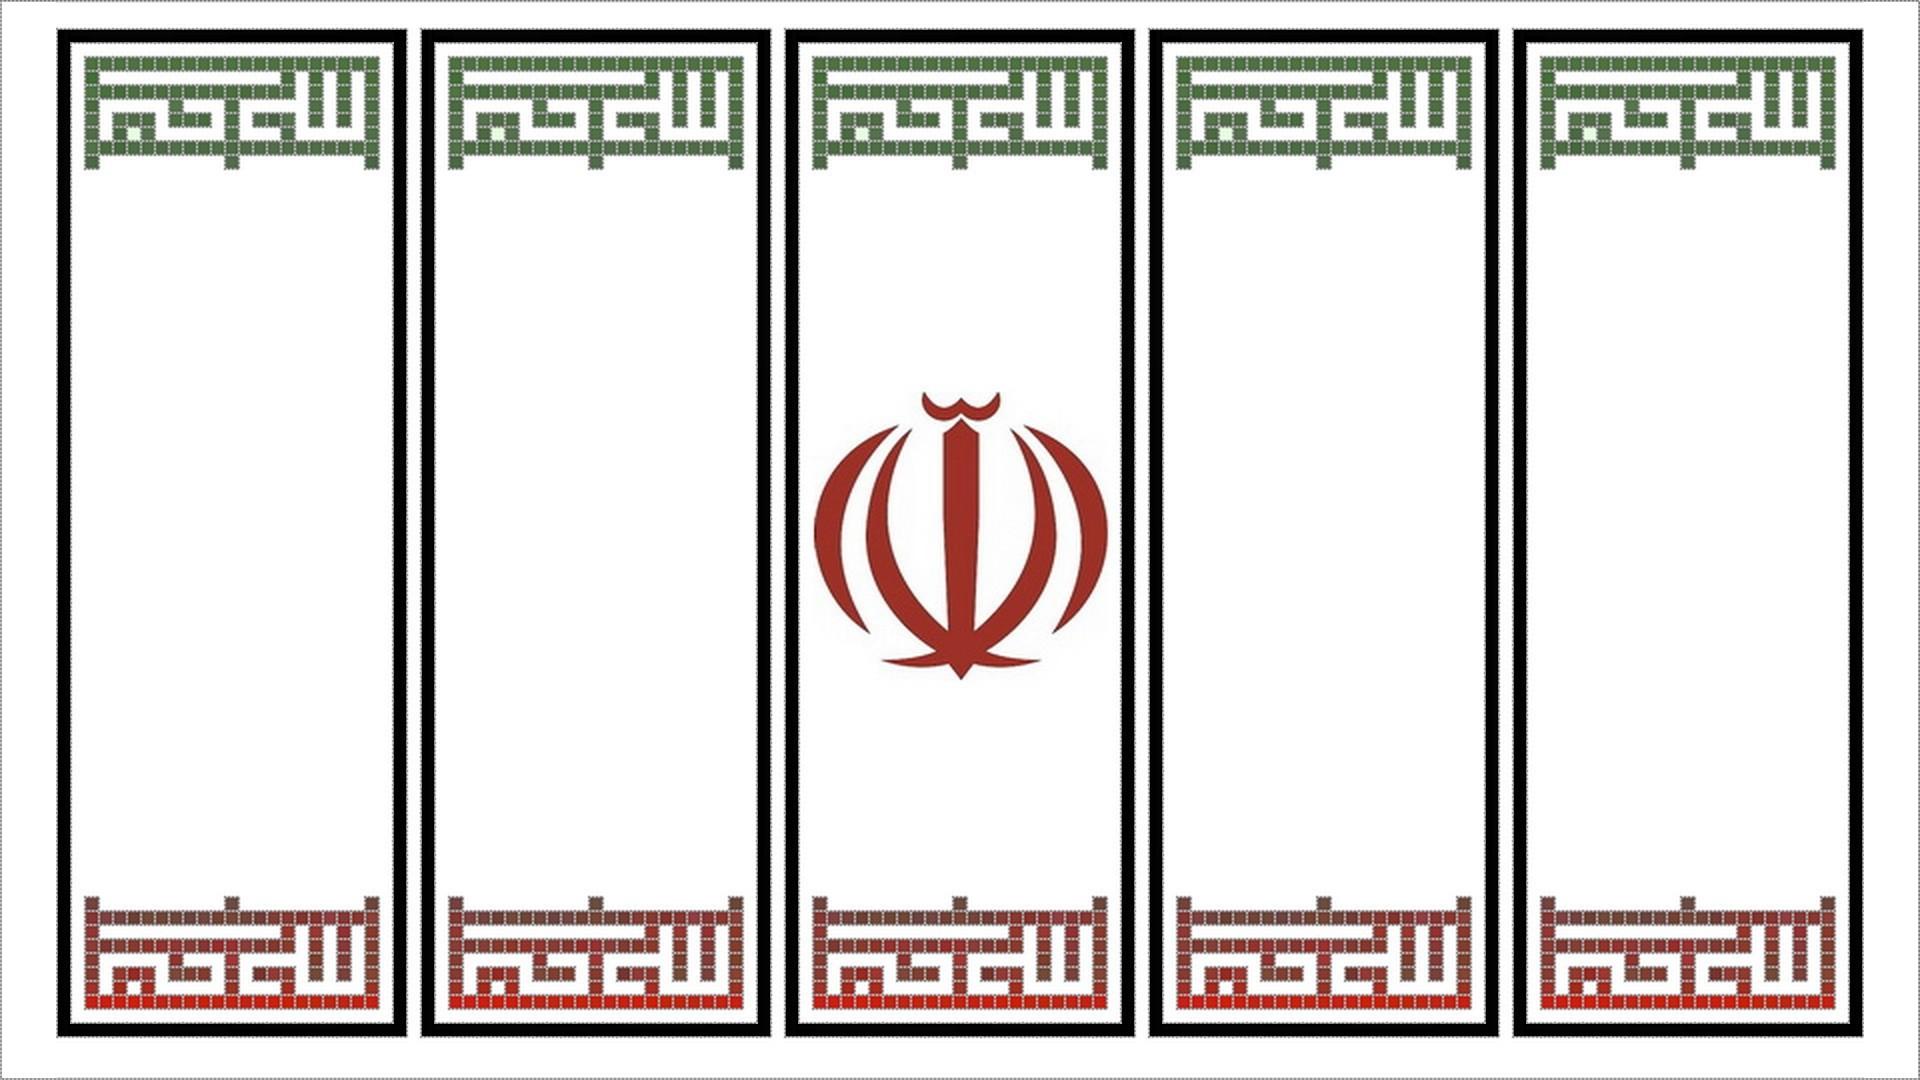 The symbol of iran on a white background wallpapers and images the symbol of iran on a white background buycottarizona Choice Image